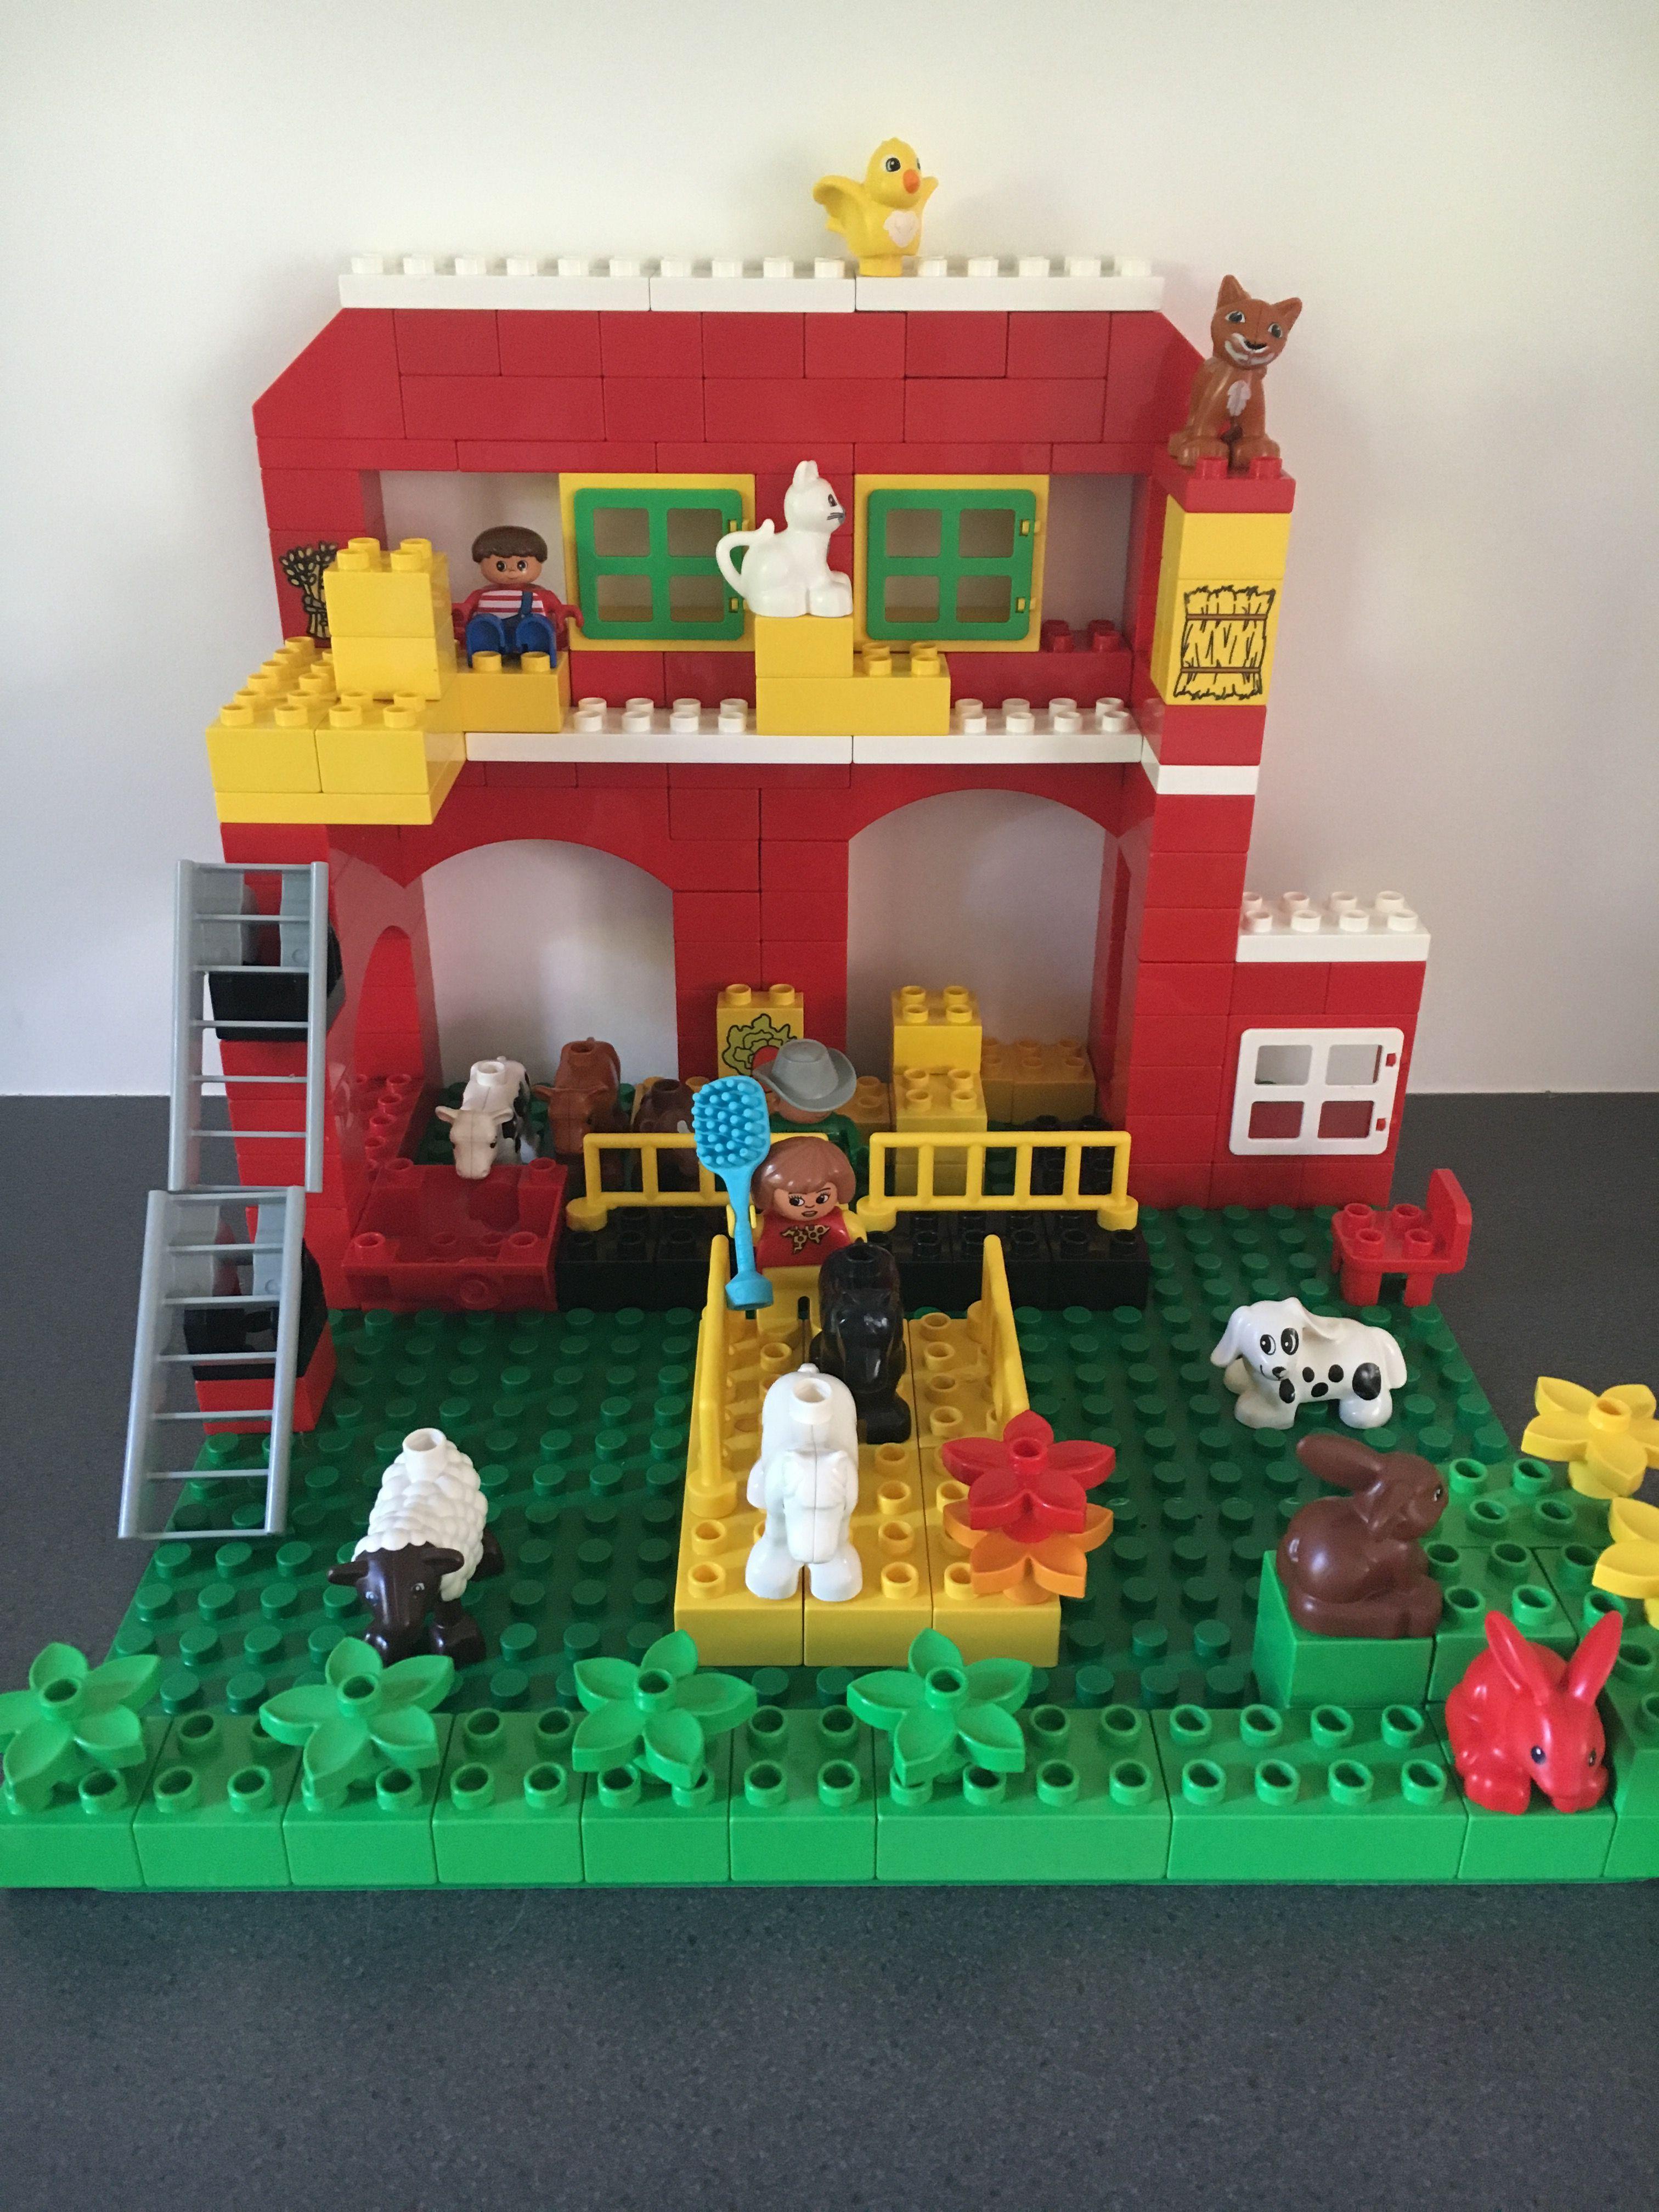 Barn duplo lego - Lego duplo ideen ...